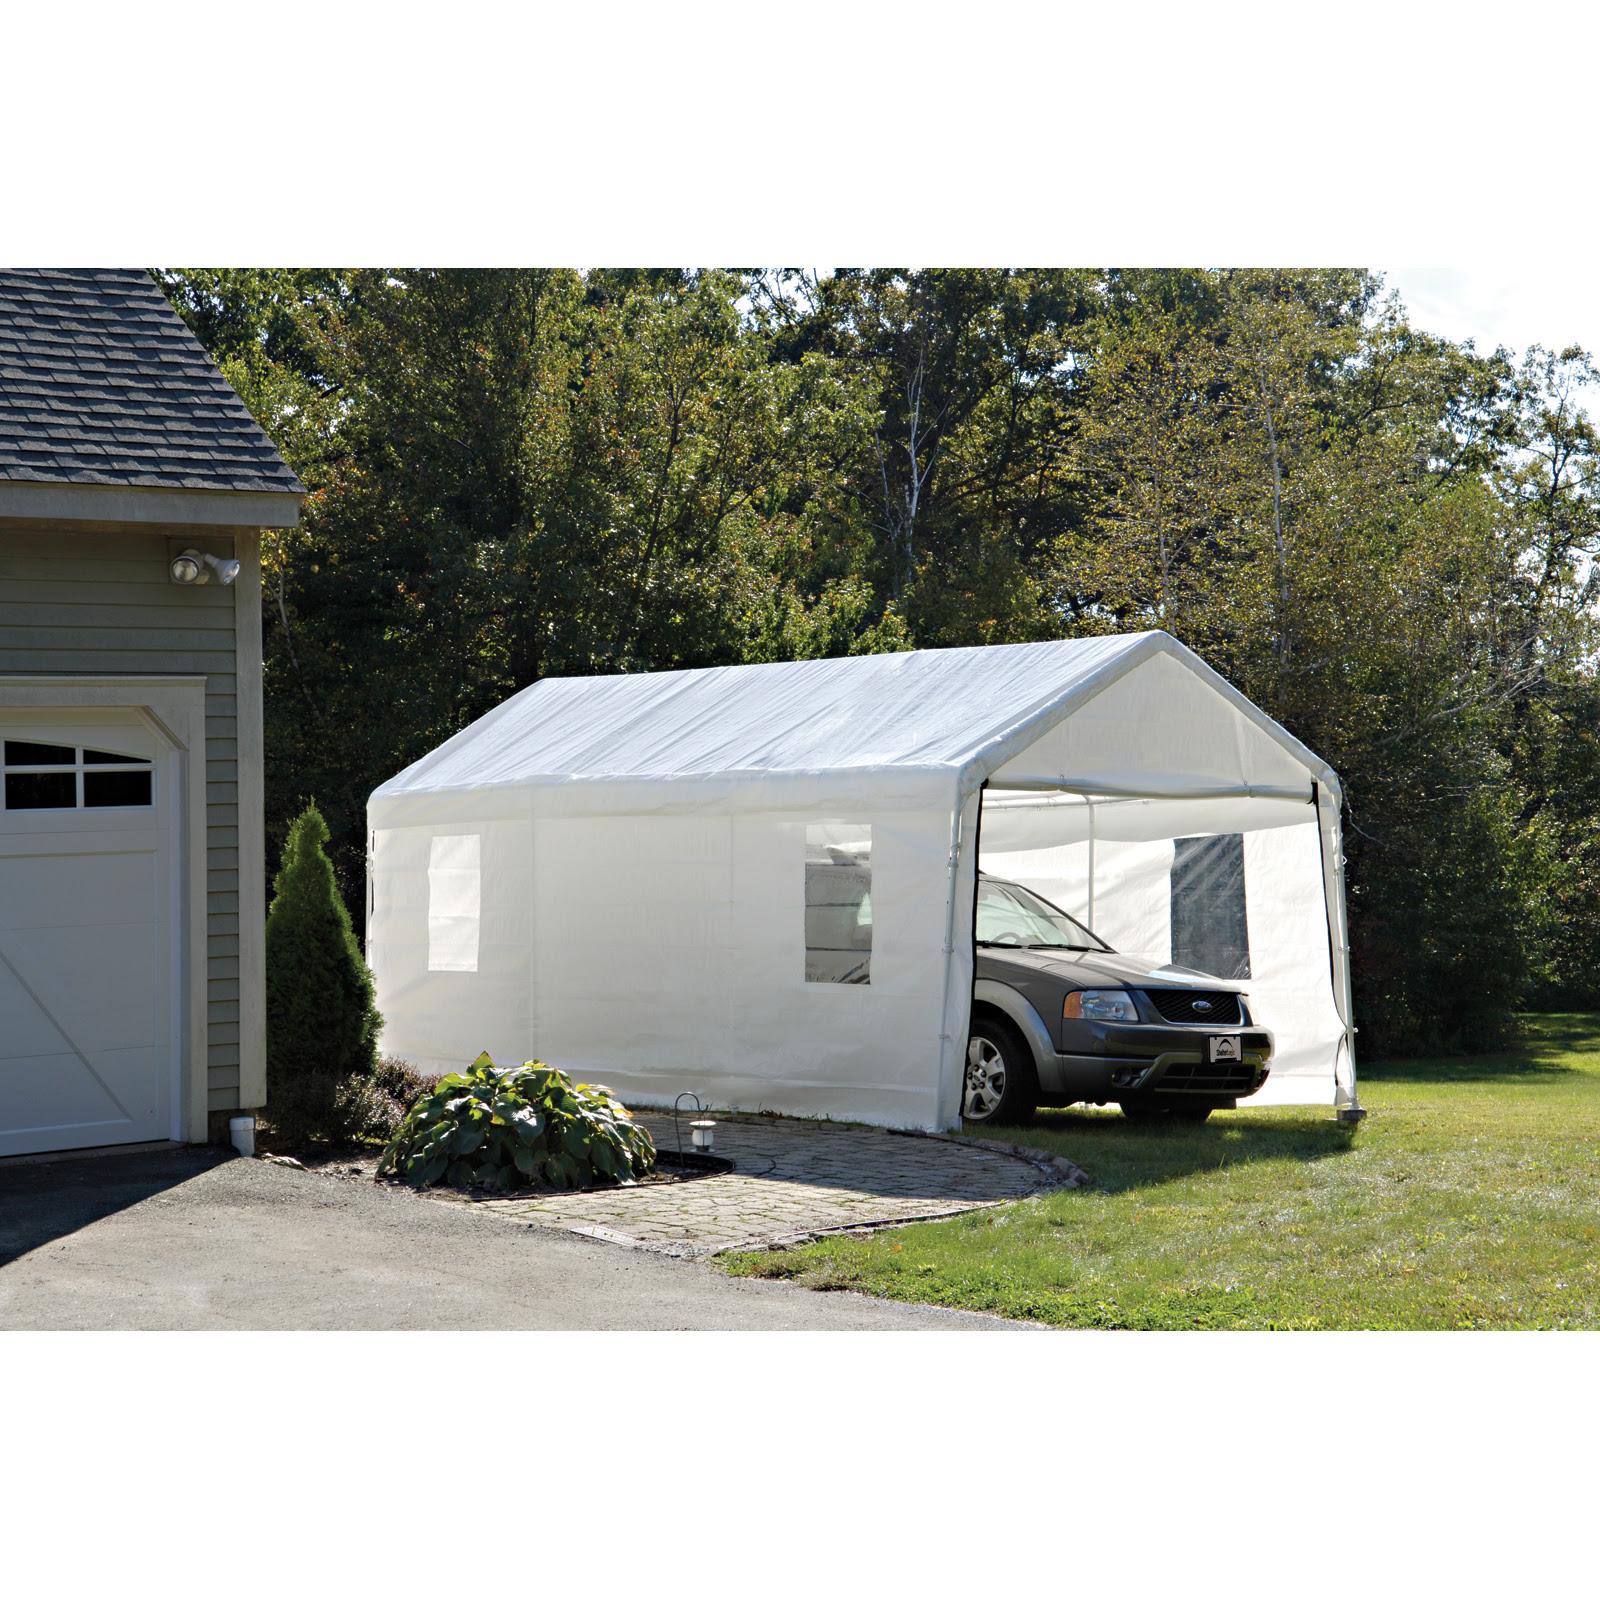 Carport Tent 10x20 & 10u0027 X 20u0027 Outdoor Carport ...